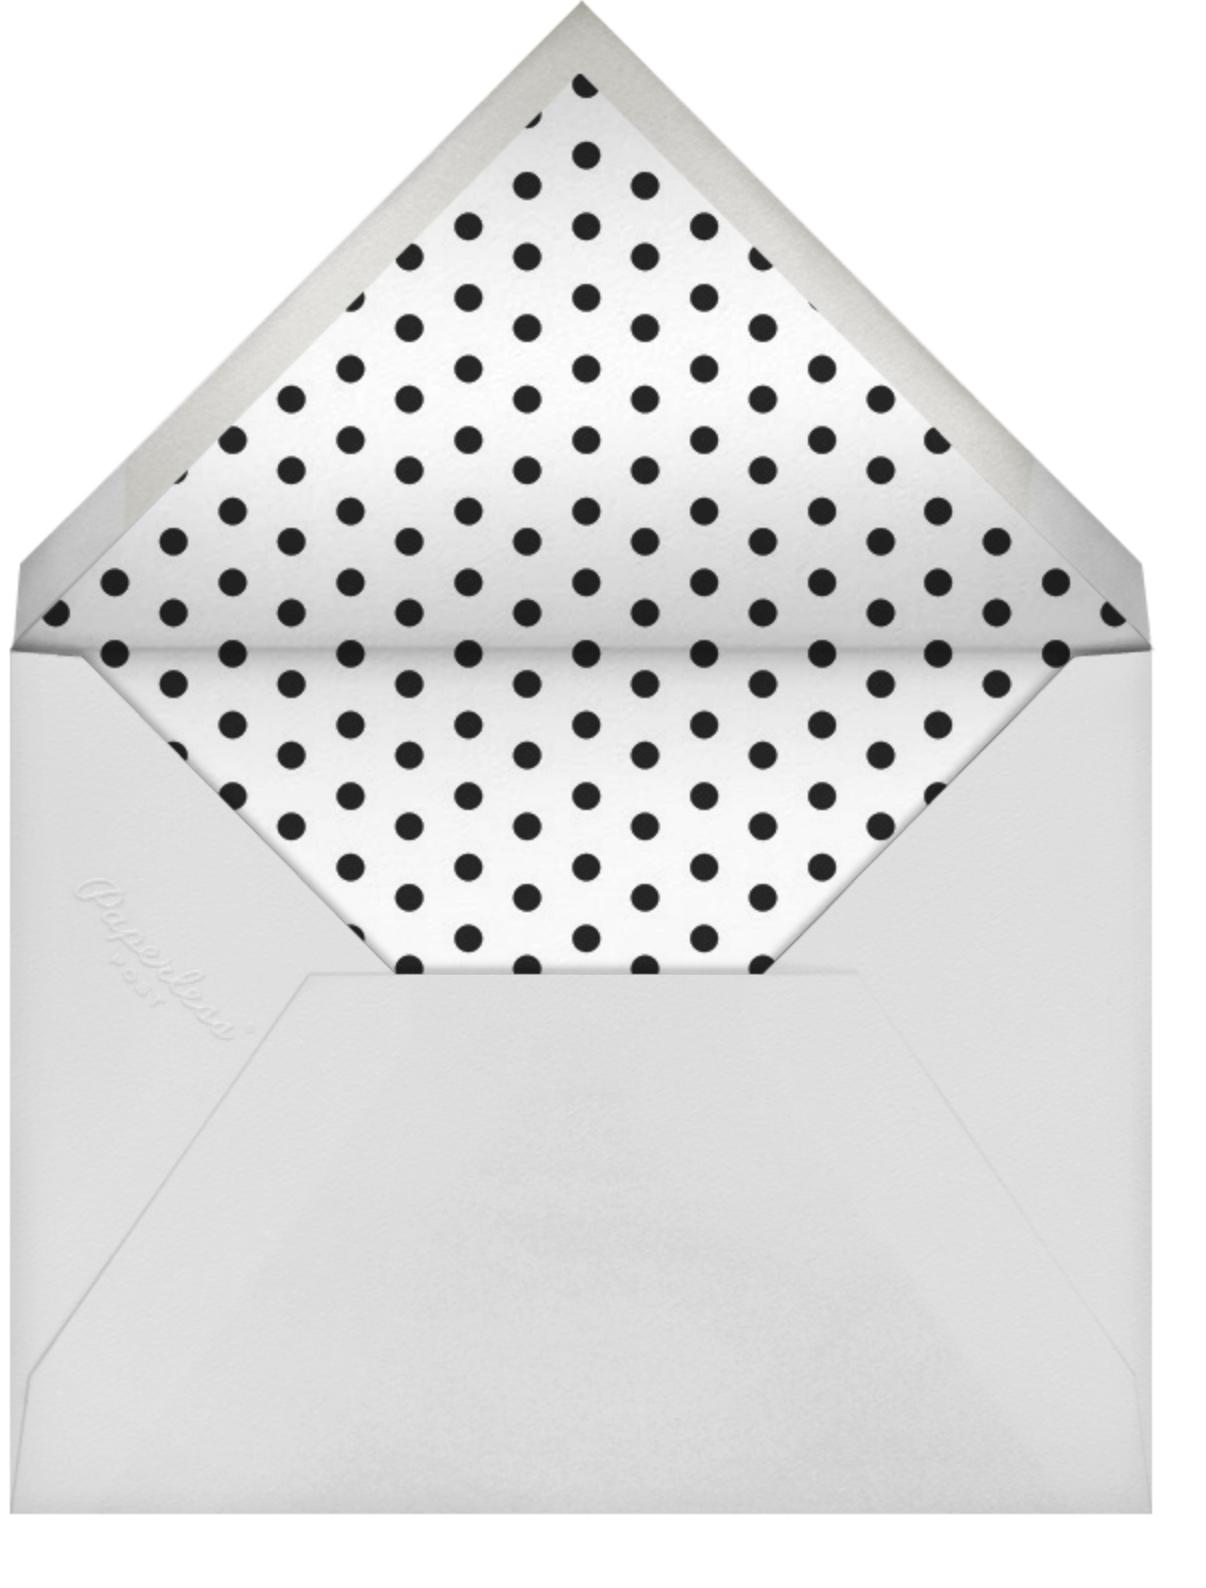 Five Dancing Photo Strips - Paperless Post - Adult birthday - envelope back